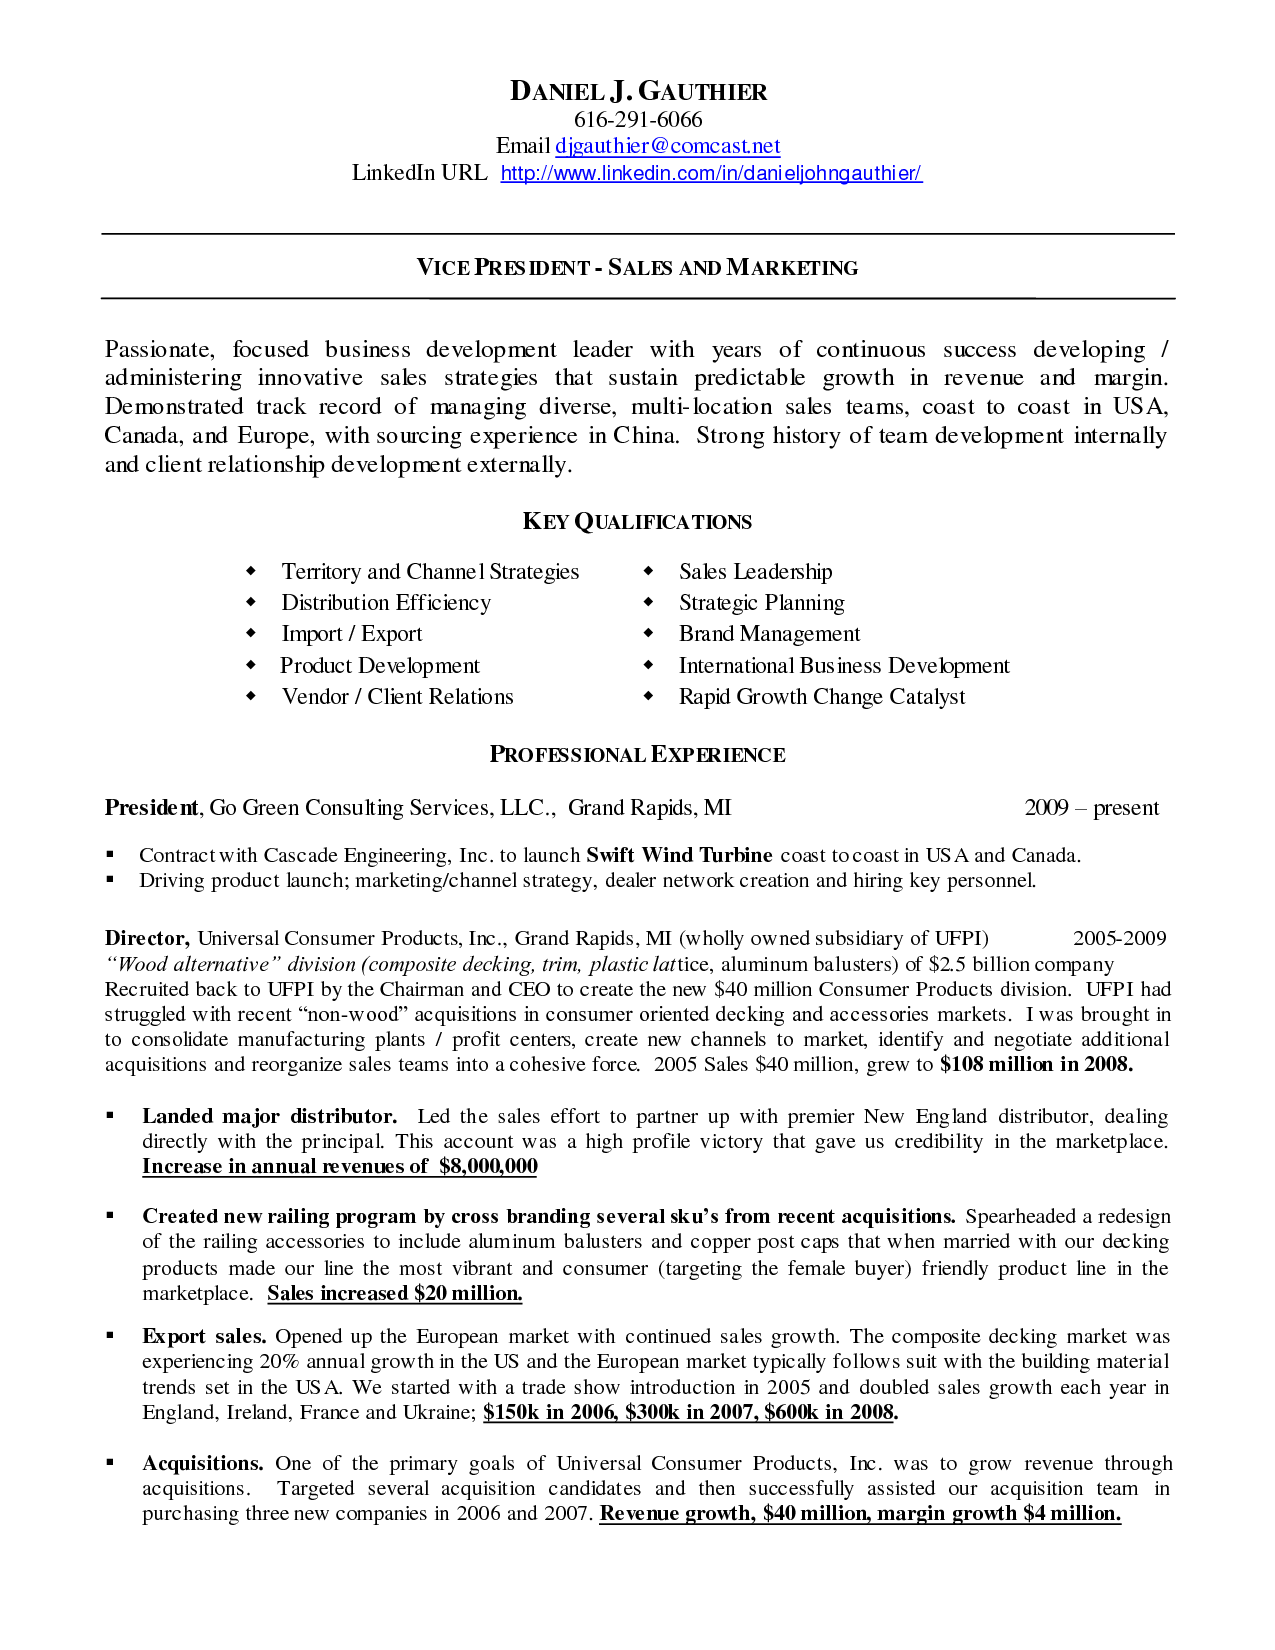 Resume Templates Linkedin Resume Templates Resume Examples Resume Tips Sales Resume Examples